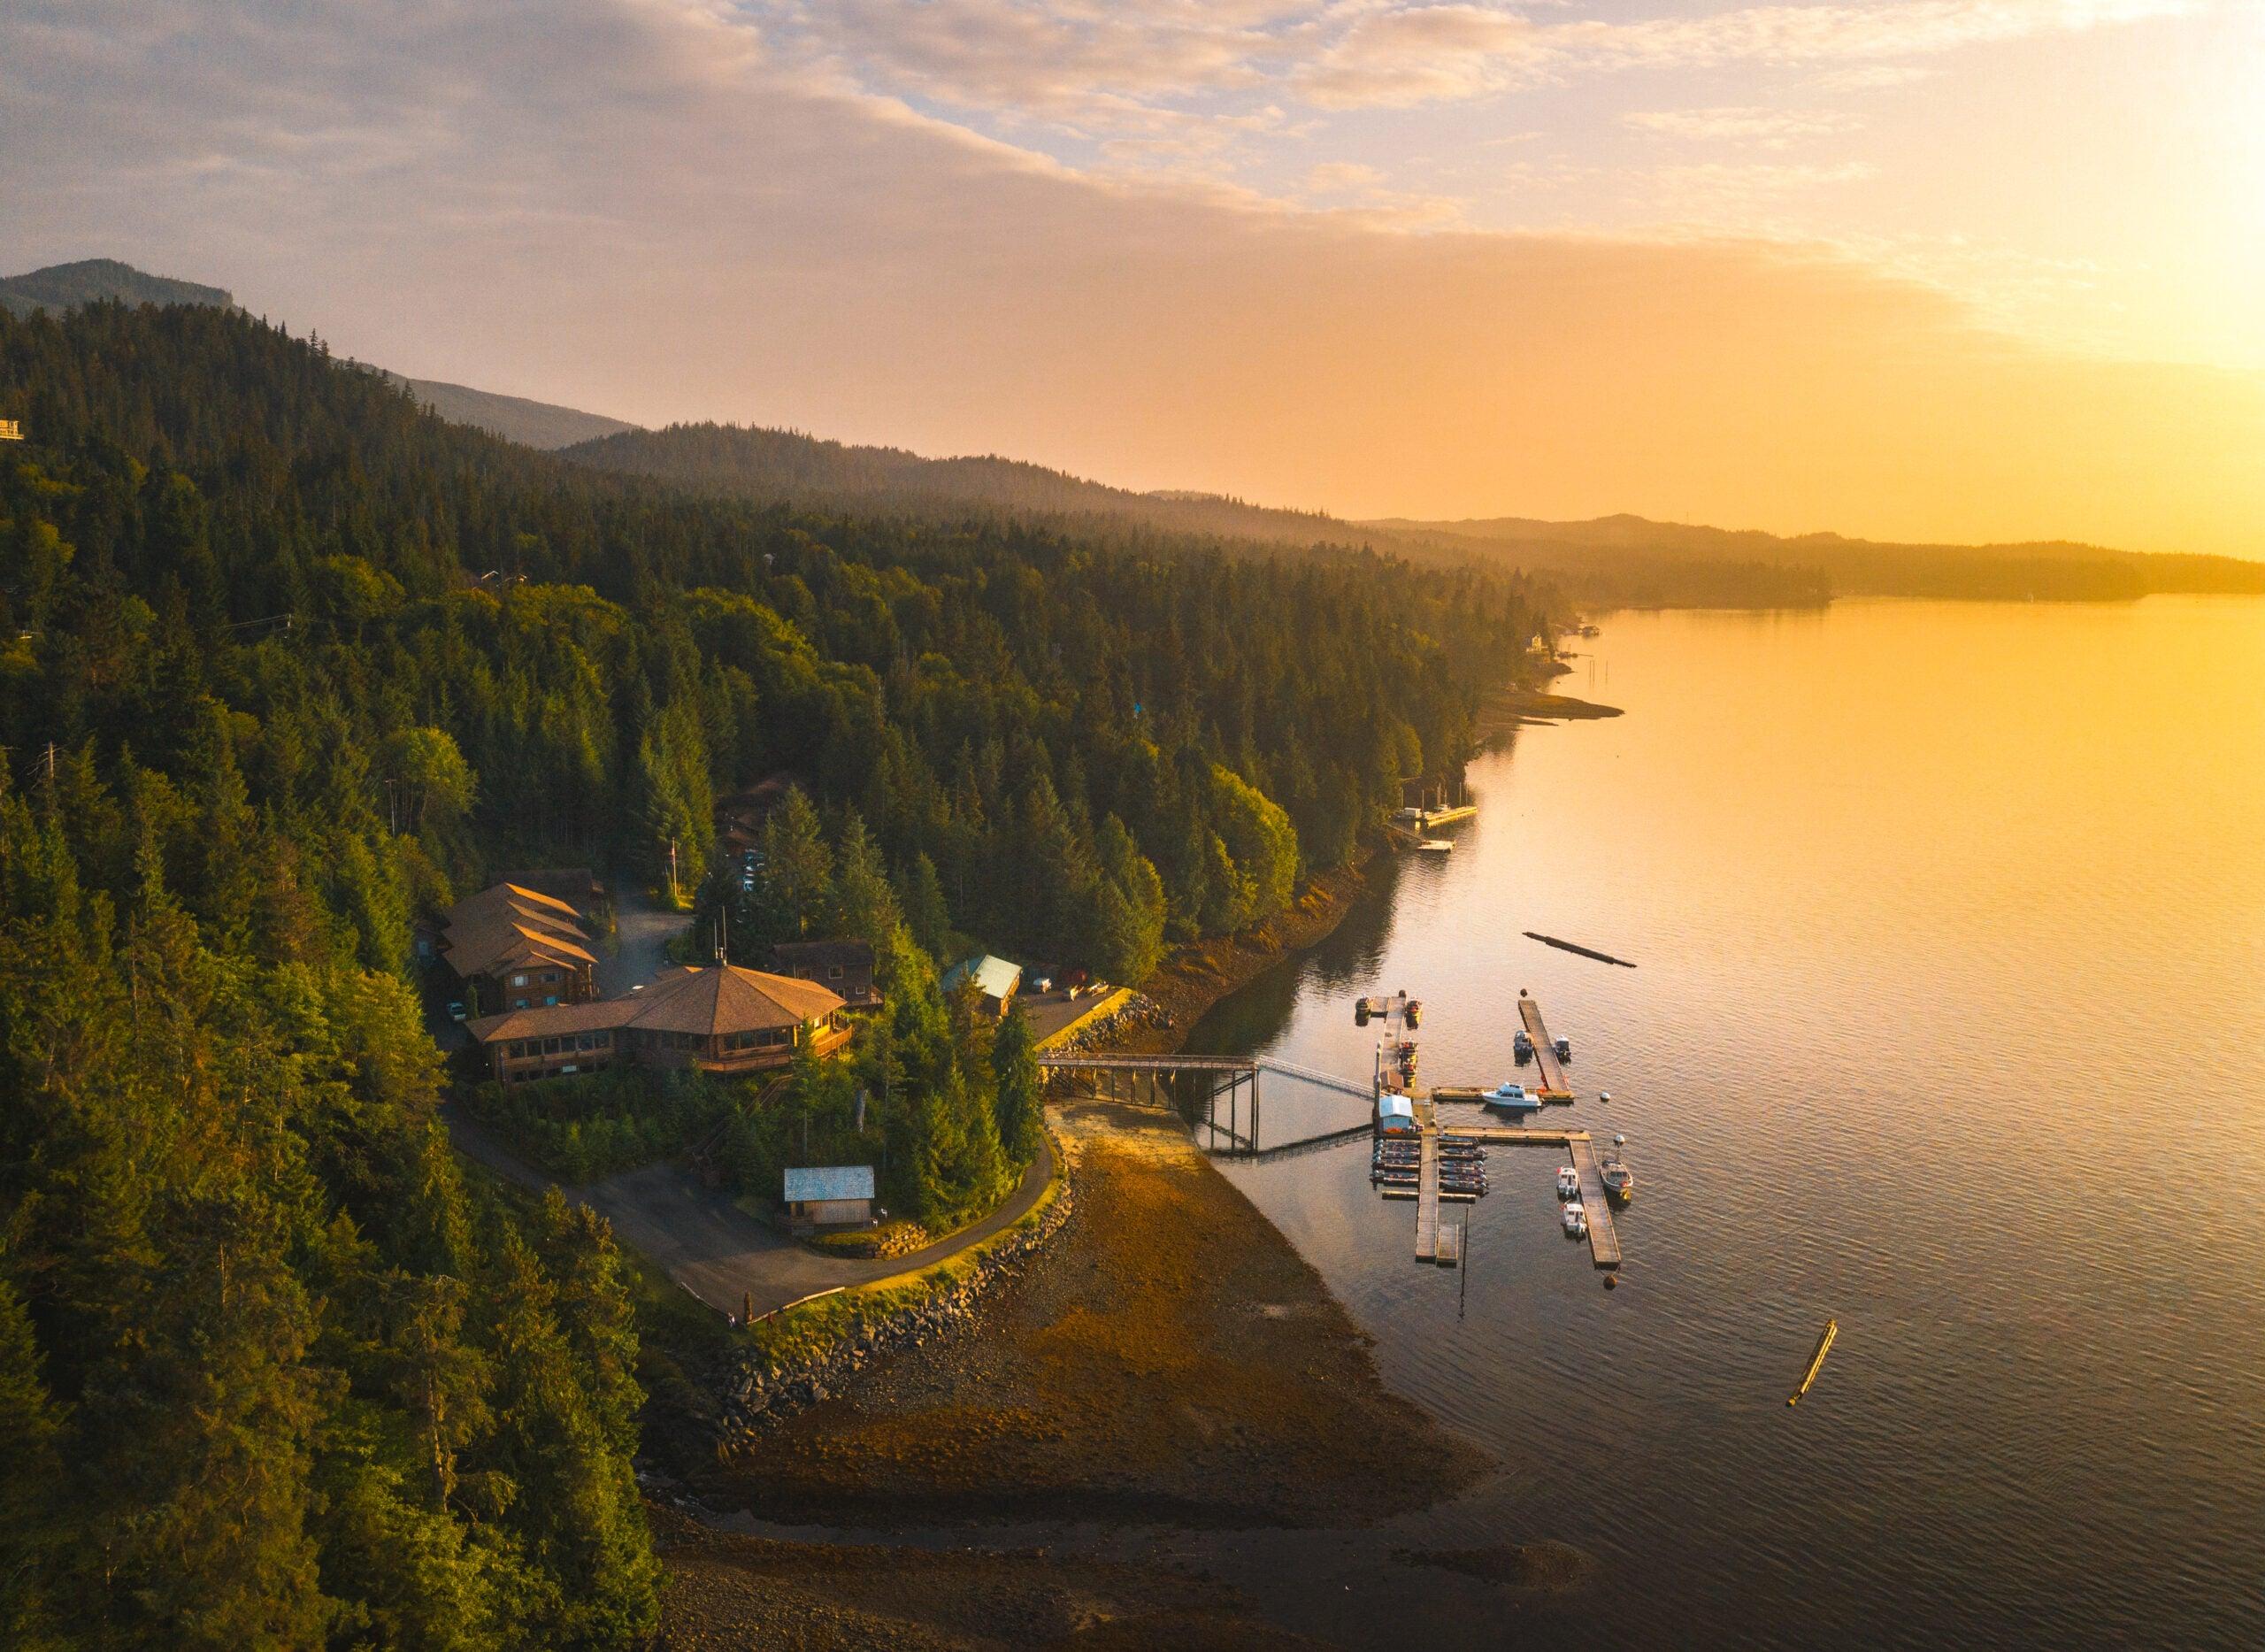 Sunset over a fishing resort in Alaska.